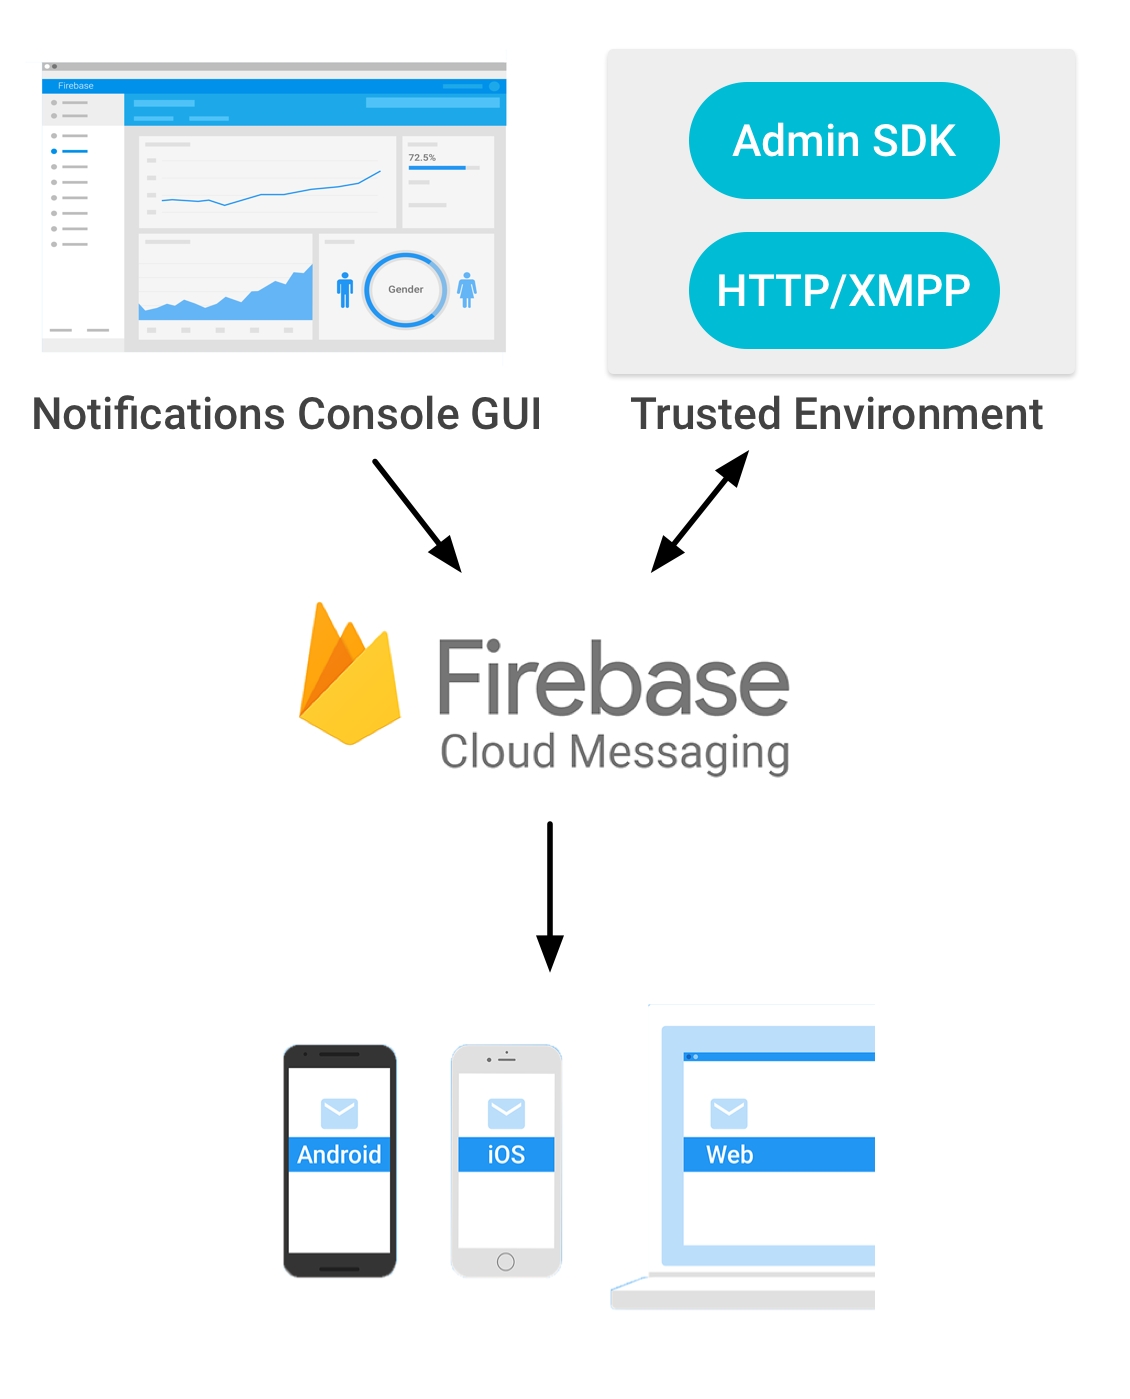 Firebase 云消息传递架构图